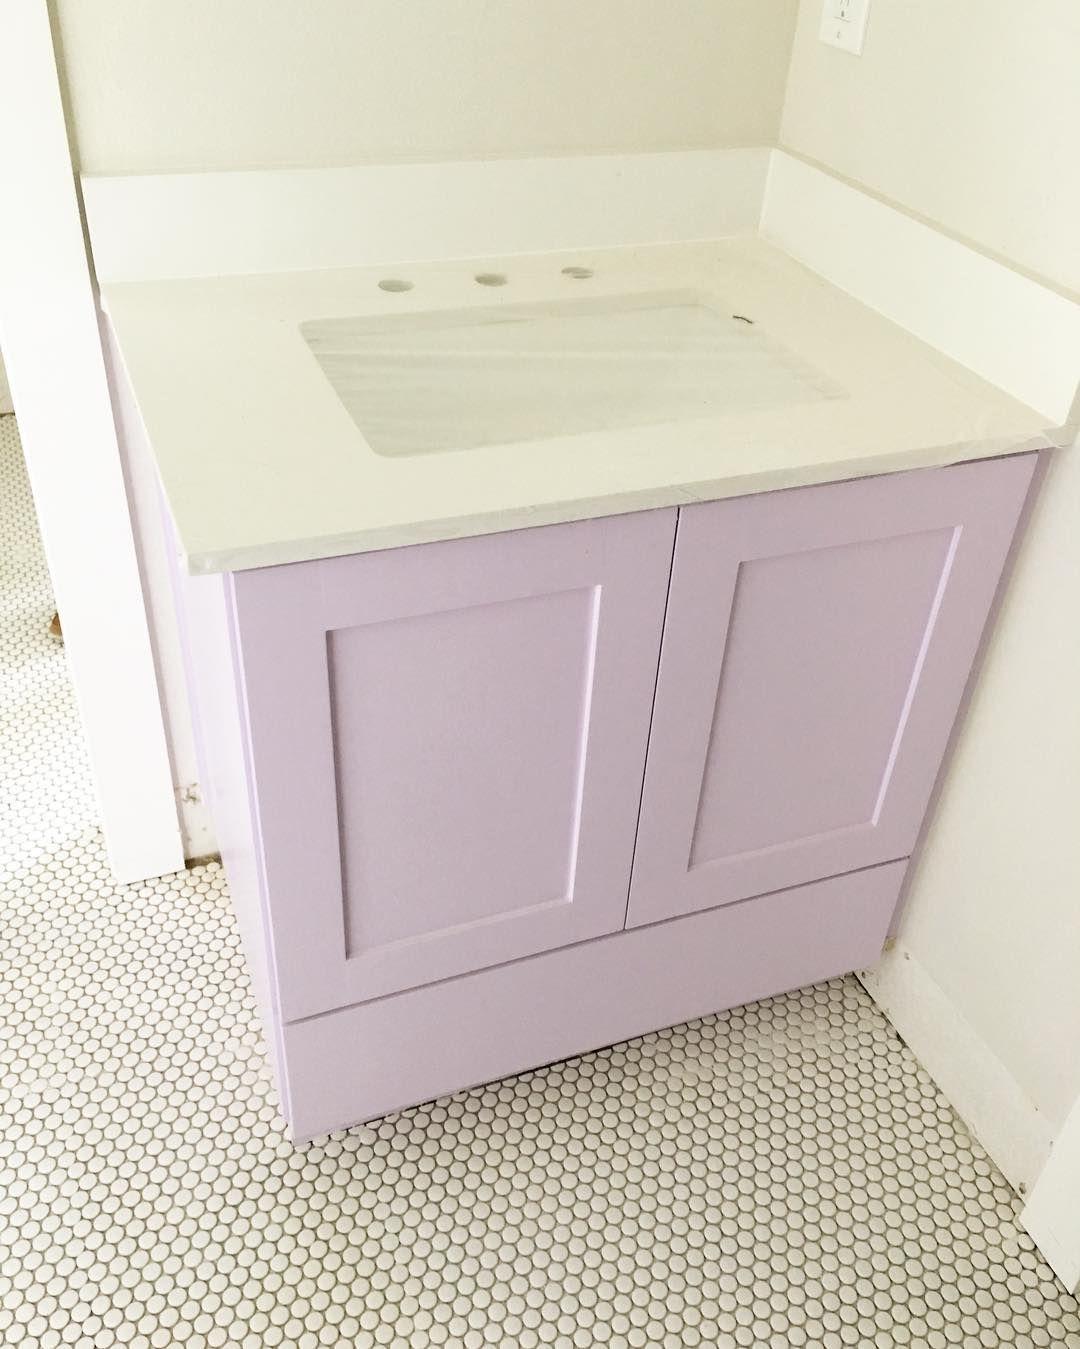 Benjamin Moore Bathroom Colors: Benjamin Moore Lily Lavender